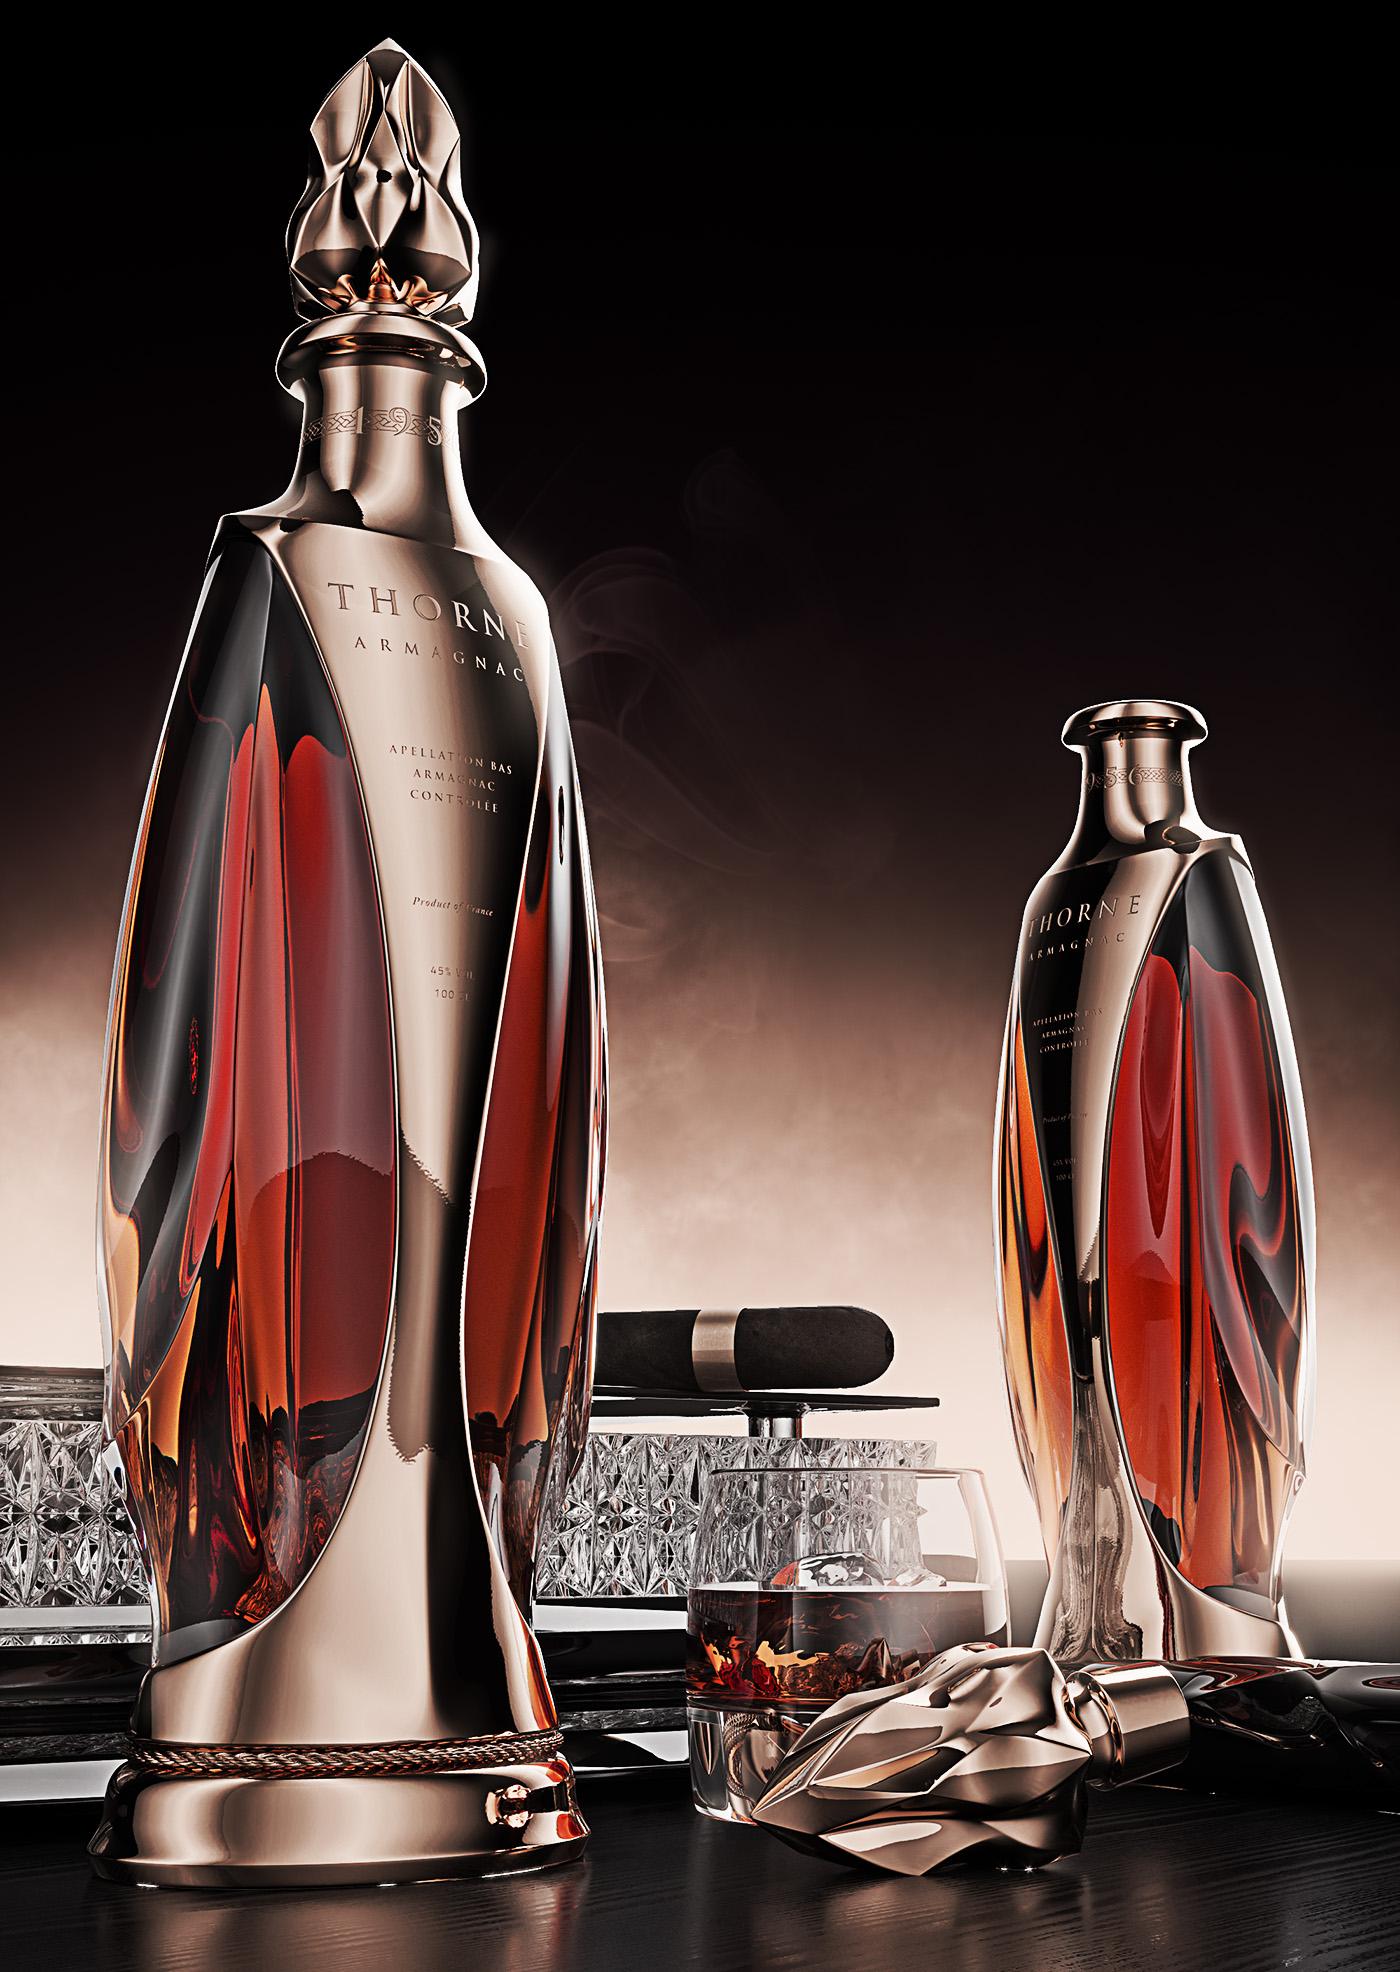 Thorne luxury armagnac bottle 6.jpg